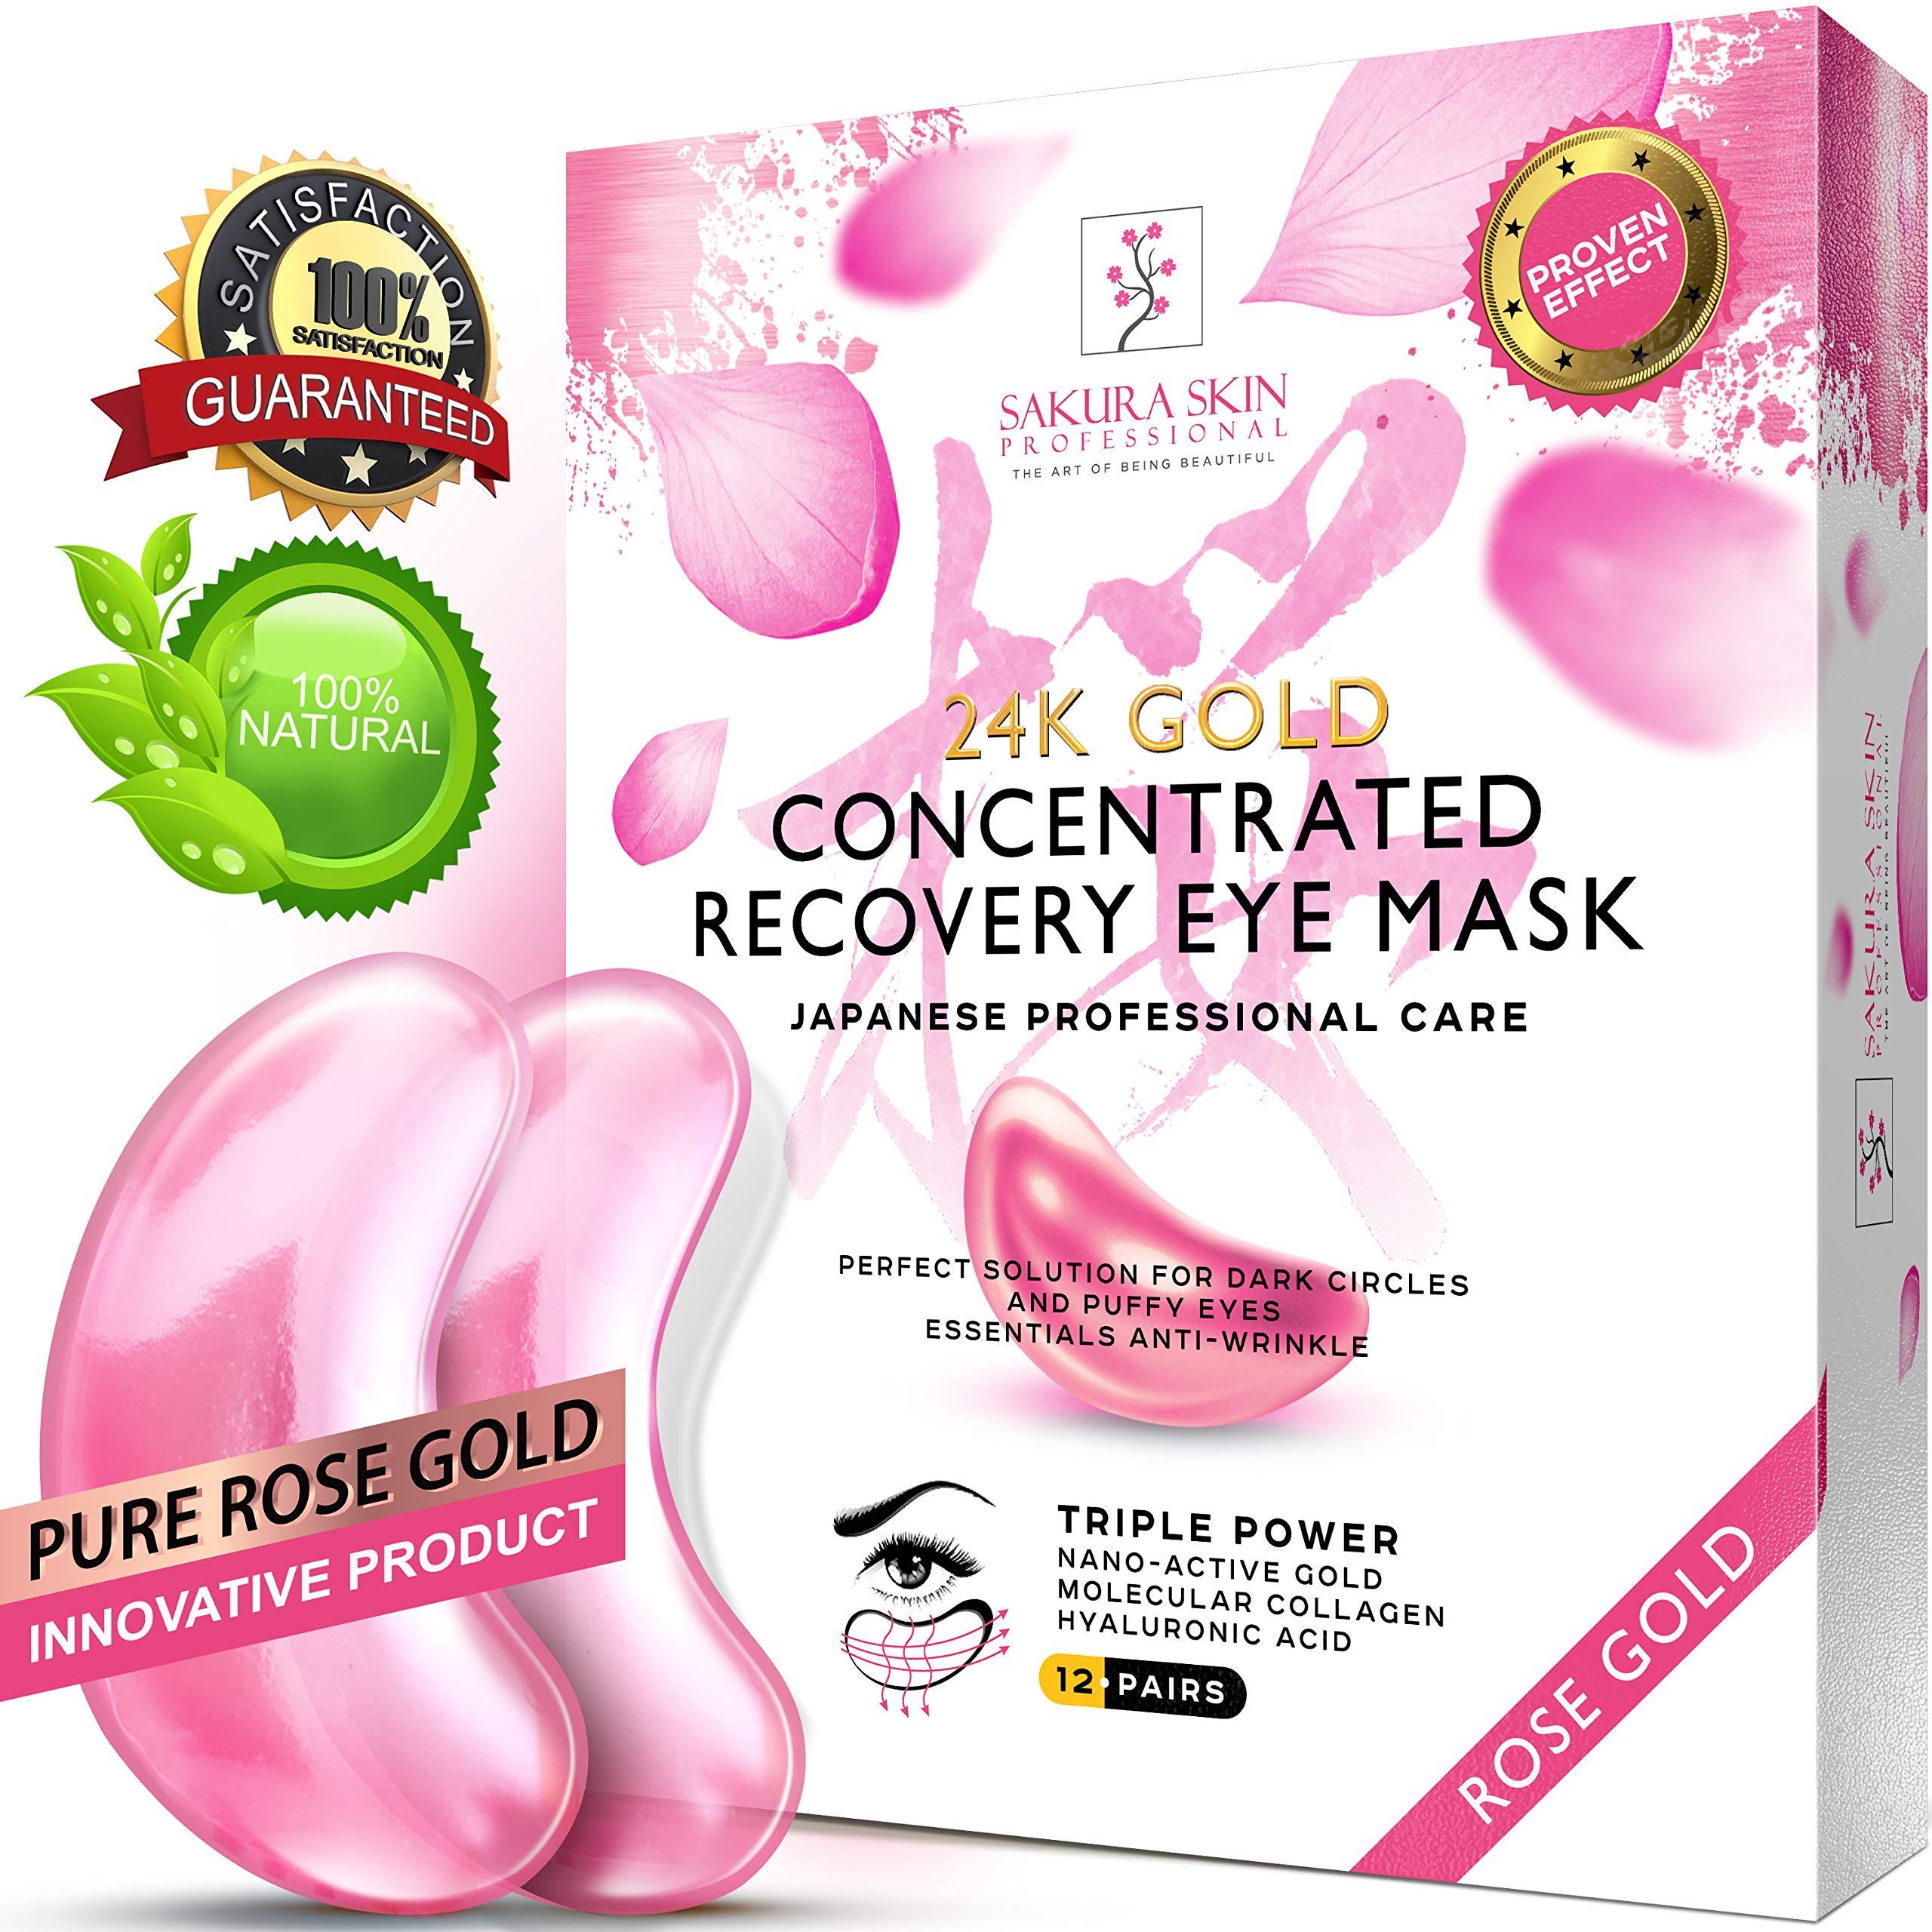 Eye Pads 24k Rose Gold Eye Mask Anti-Aging Hyaluronic Acid Eye Patches Pink Under Eye Mask for Moisturizing & Reducing Dark Circles Puffiness Wrinkles by SWISSÖKOLAB